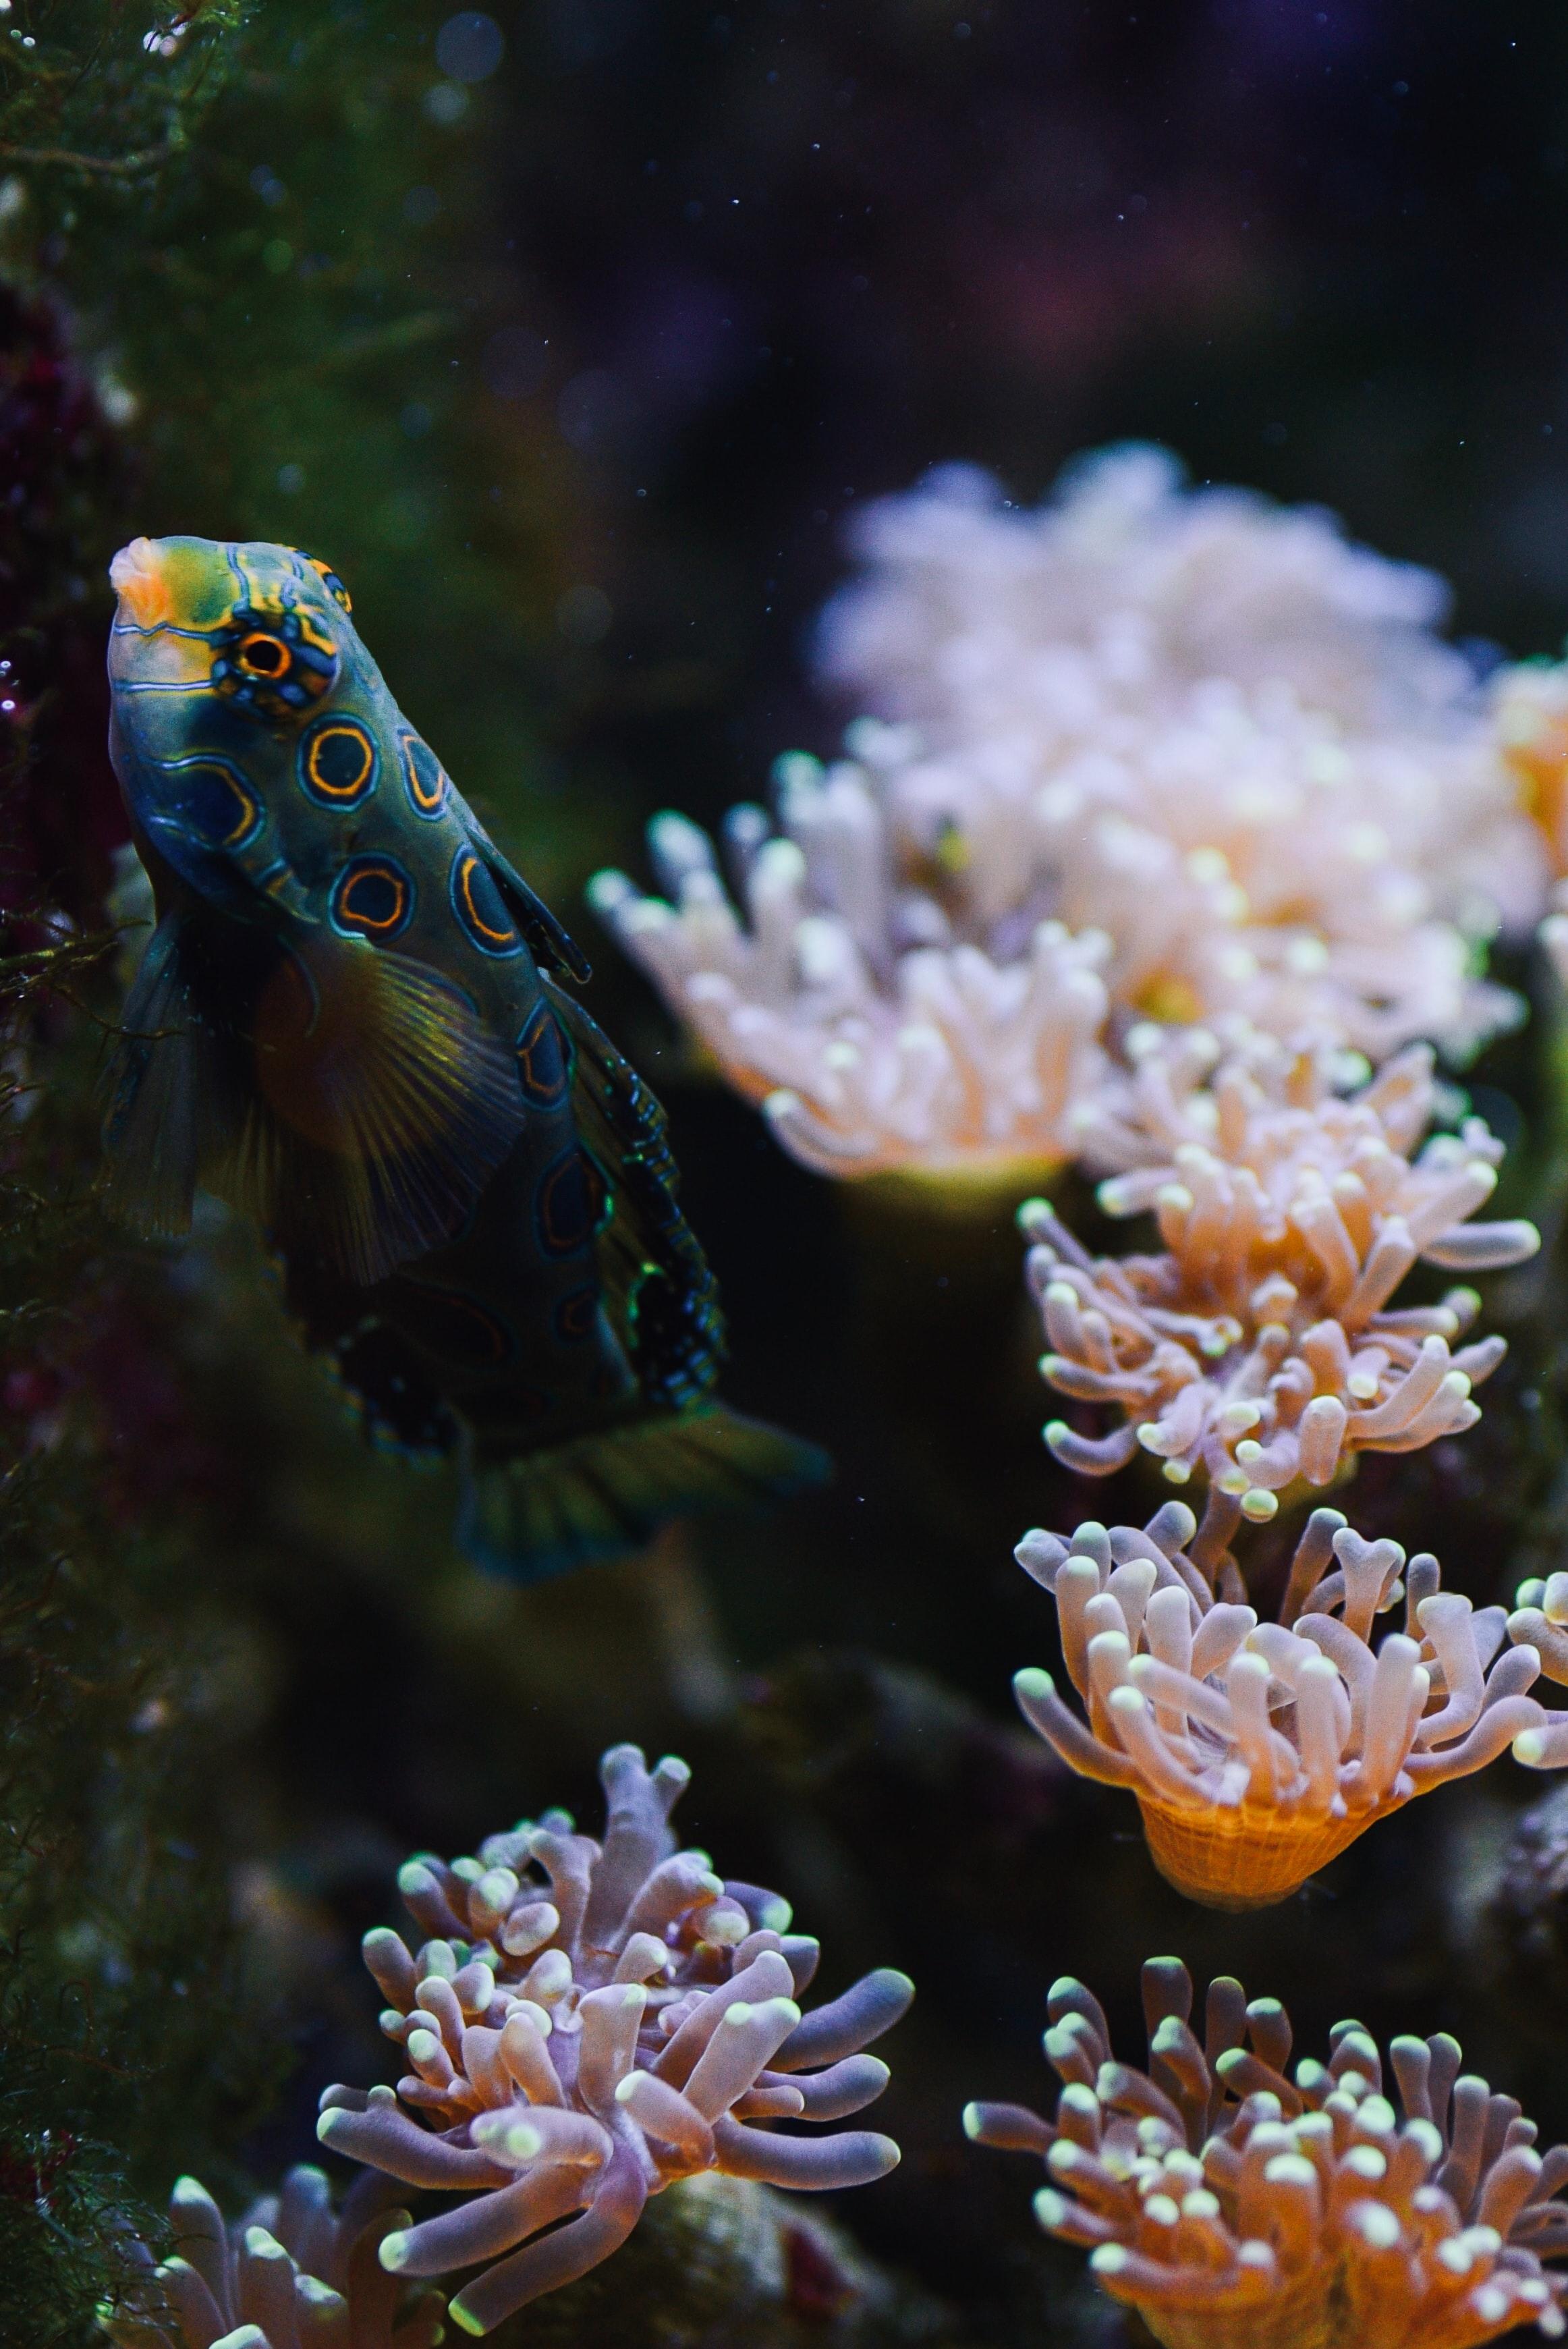 84413 Screensavers and Wallpapers Aquarium for phone. Download Animals, Water, Coral, Aquarium, Fish pictures for free